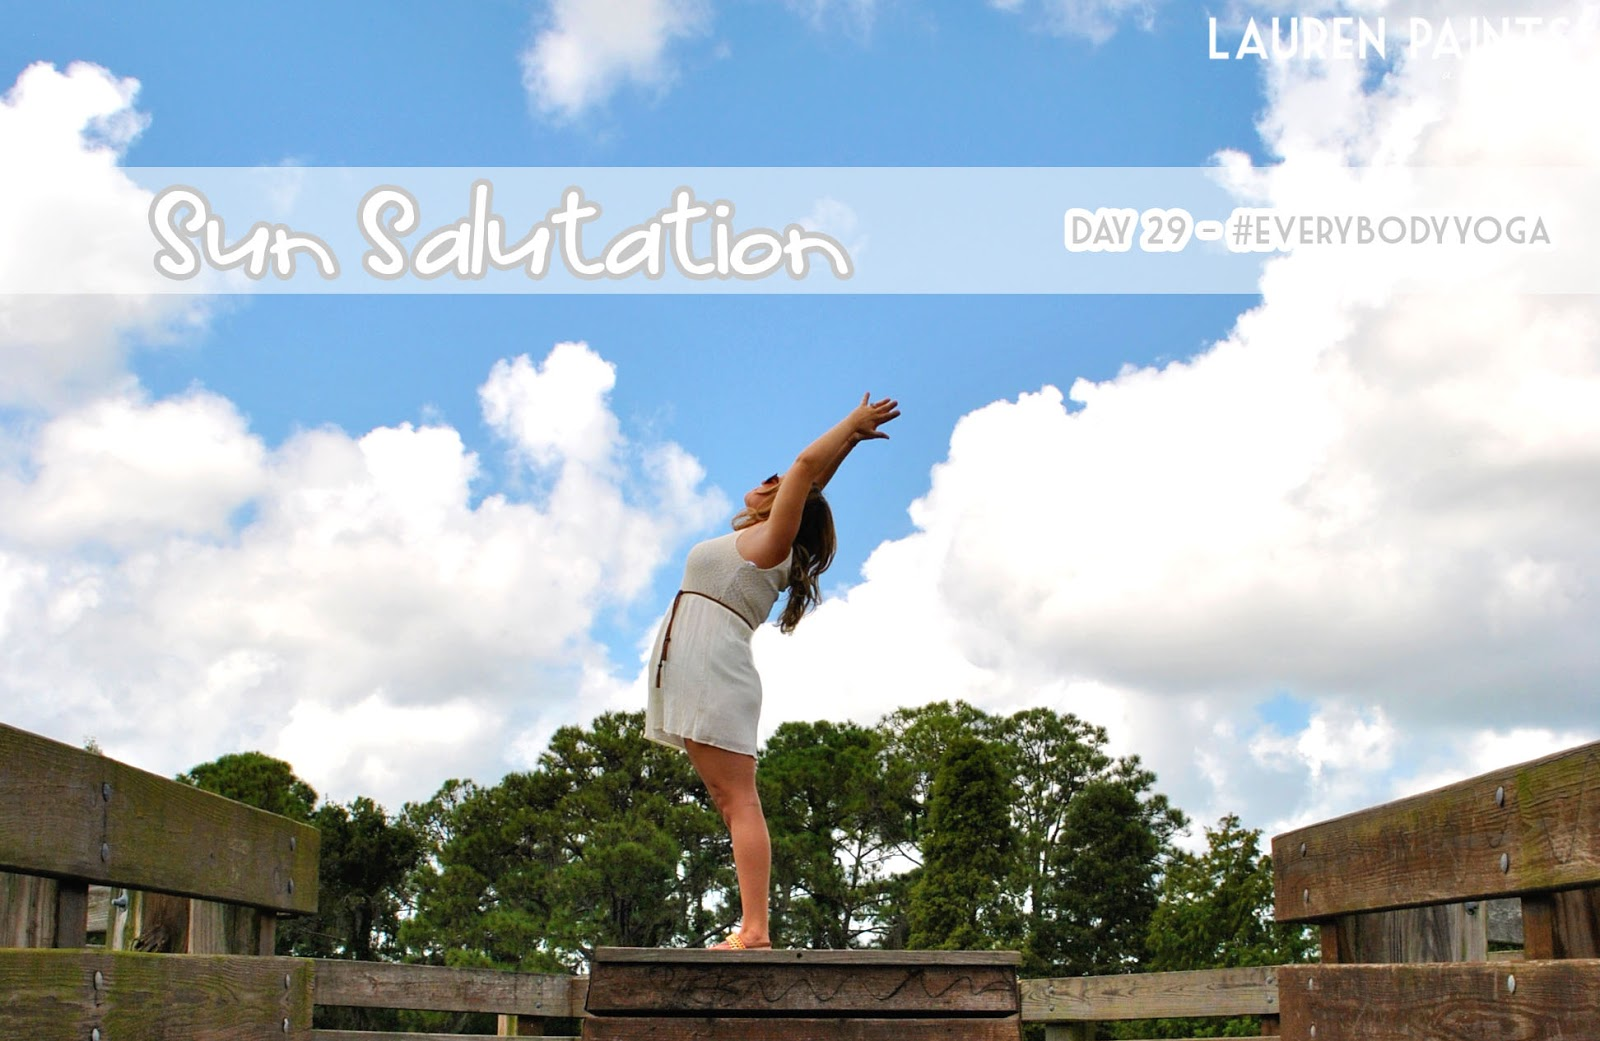 #EveryBodyYoga Day 29 - Sun Salutation or Upward Salute